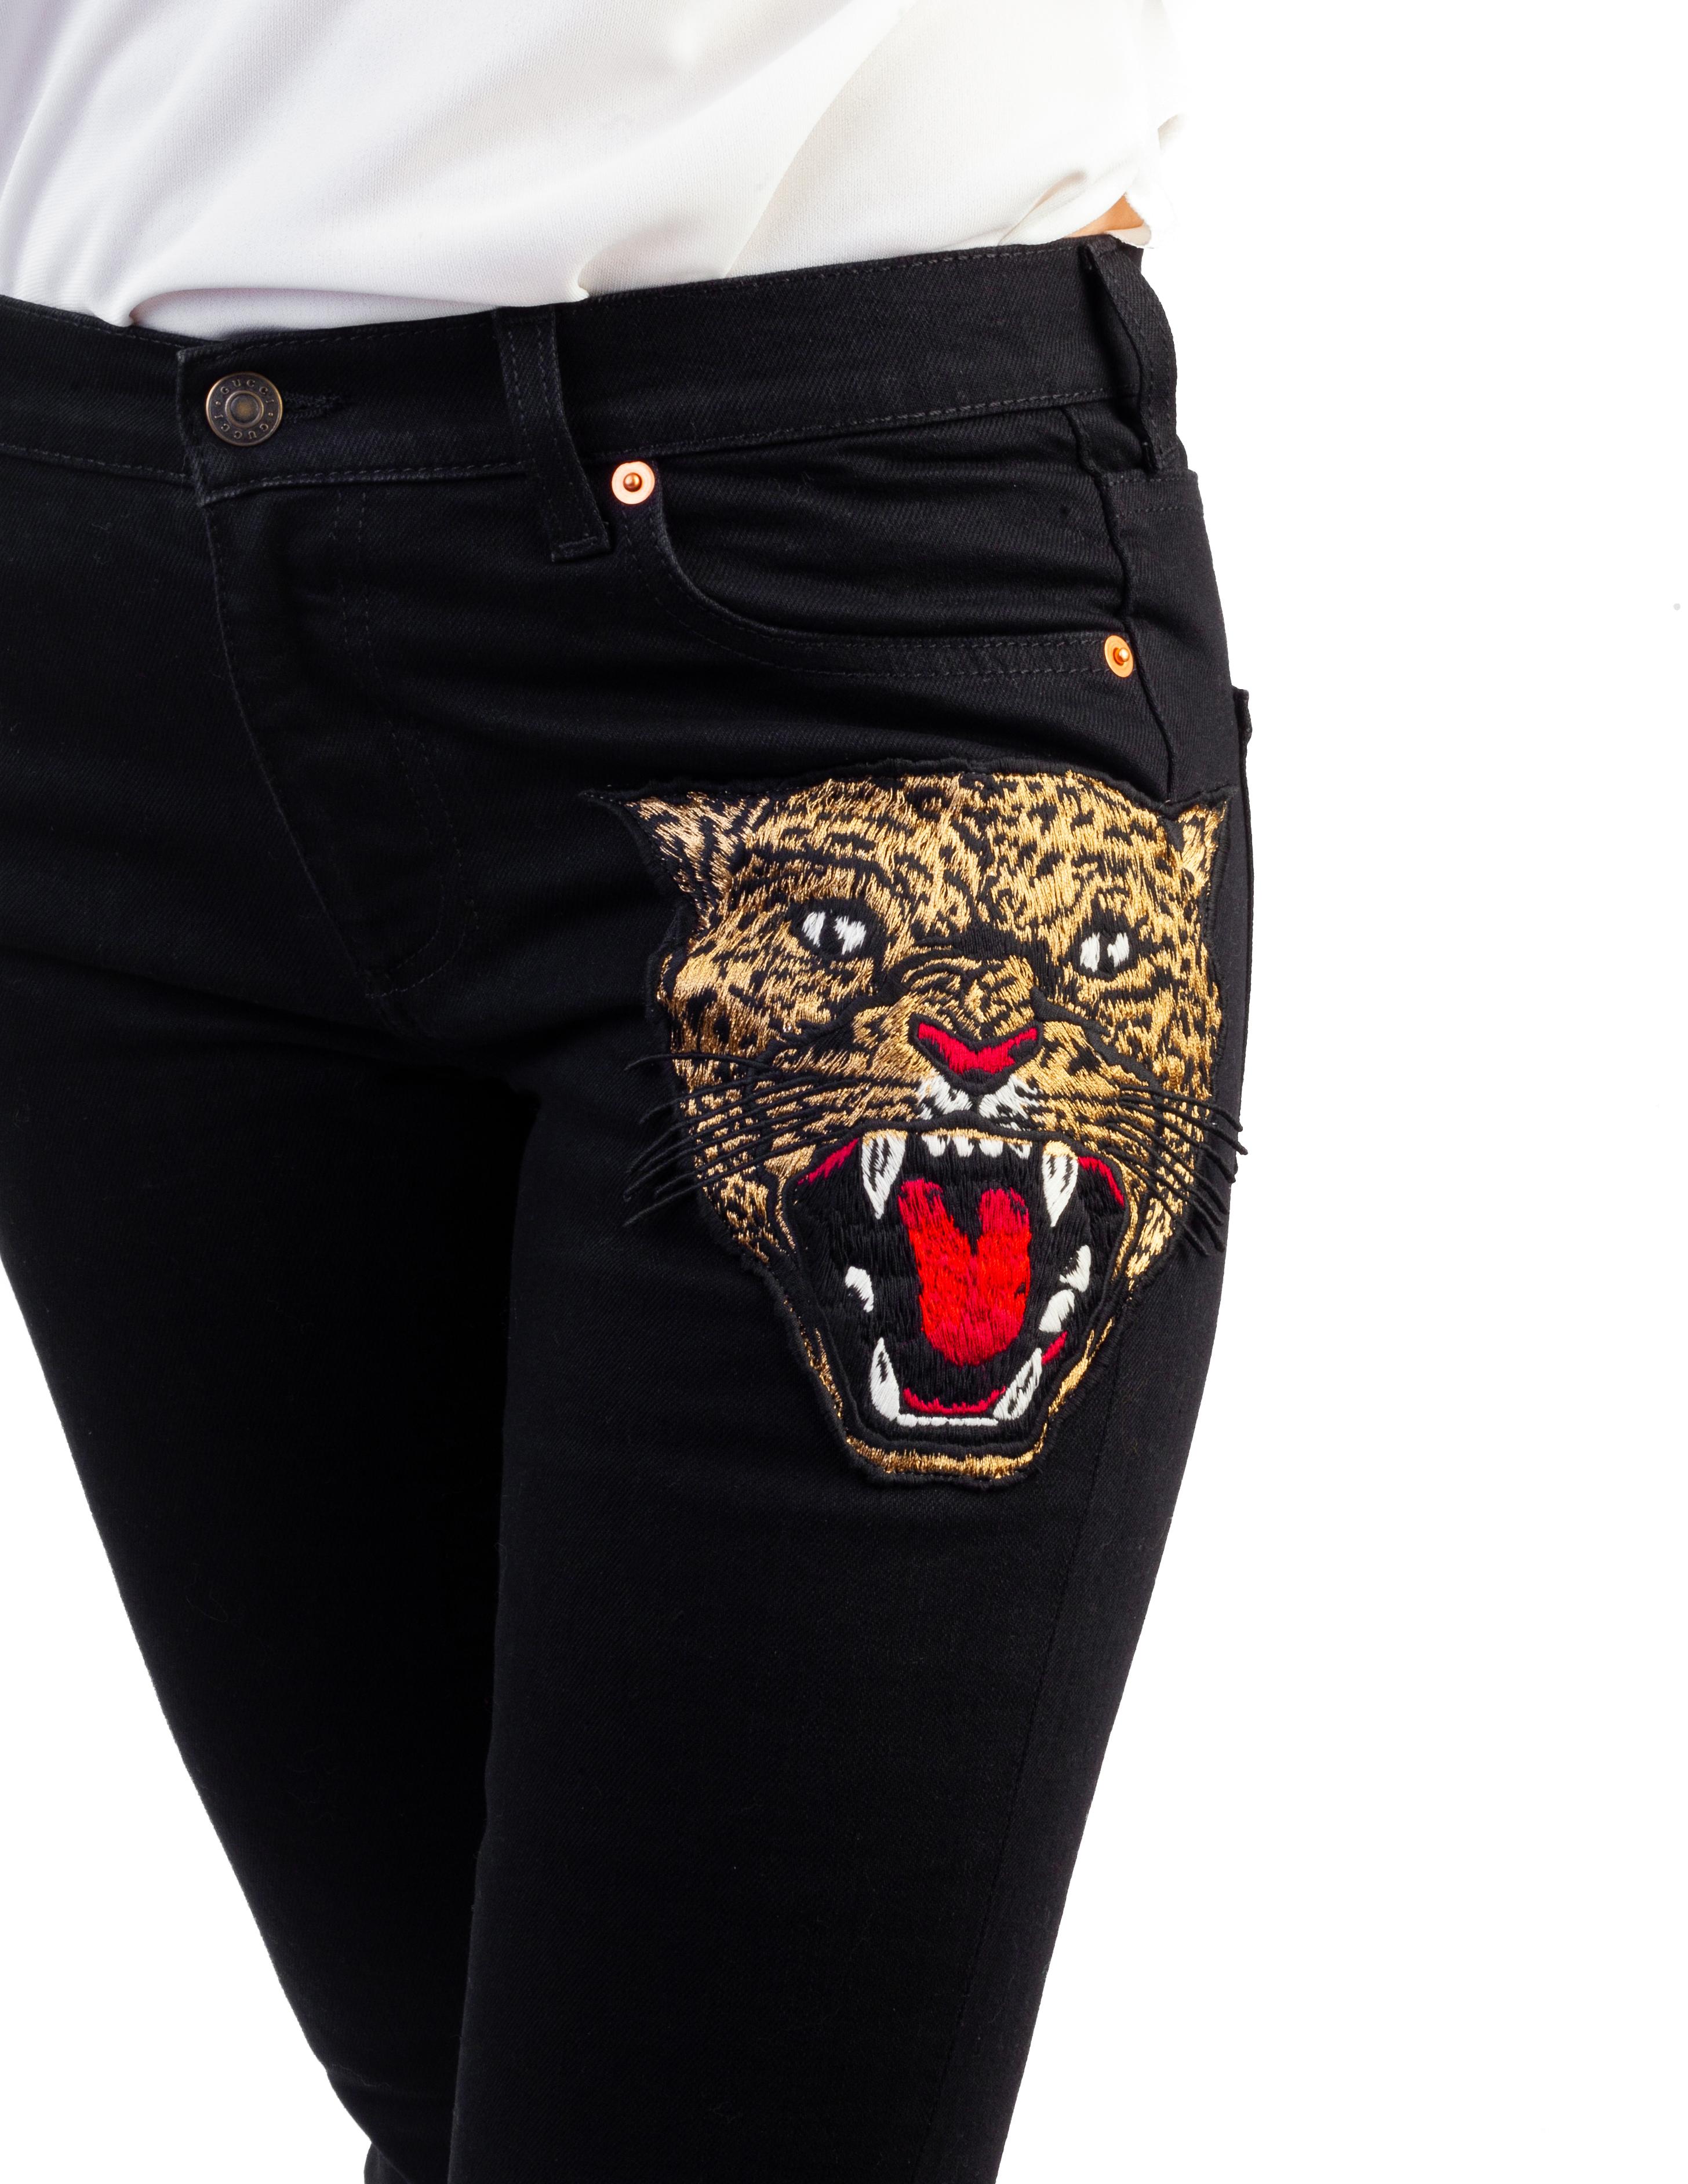 1431c9f2ed Gucci Women's Cotton Embroidered Tiger Applique Denim Jeans Pants Black